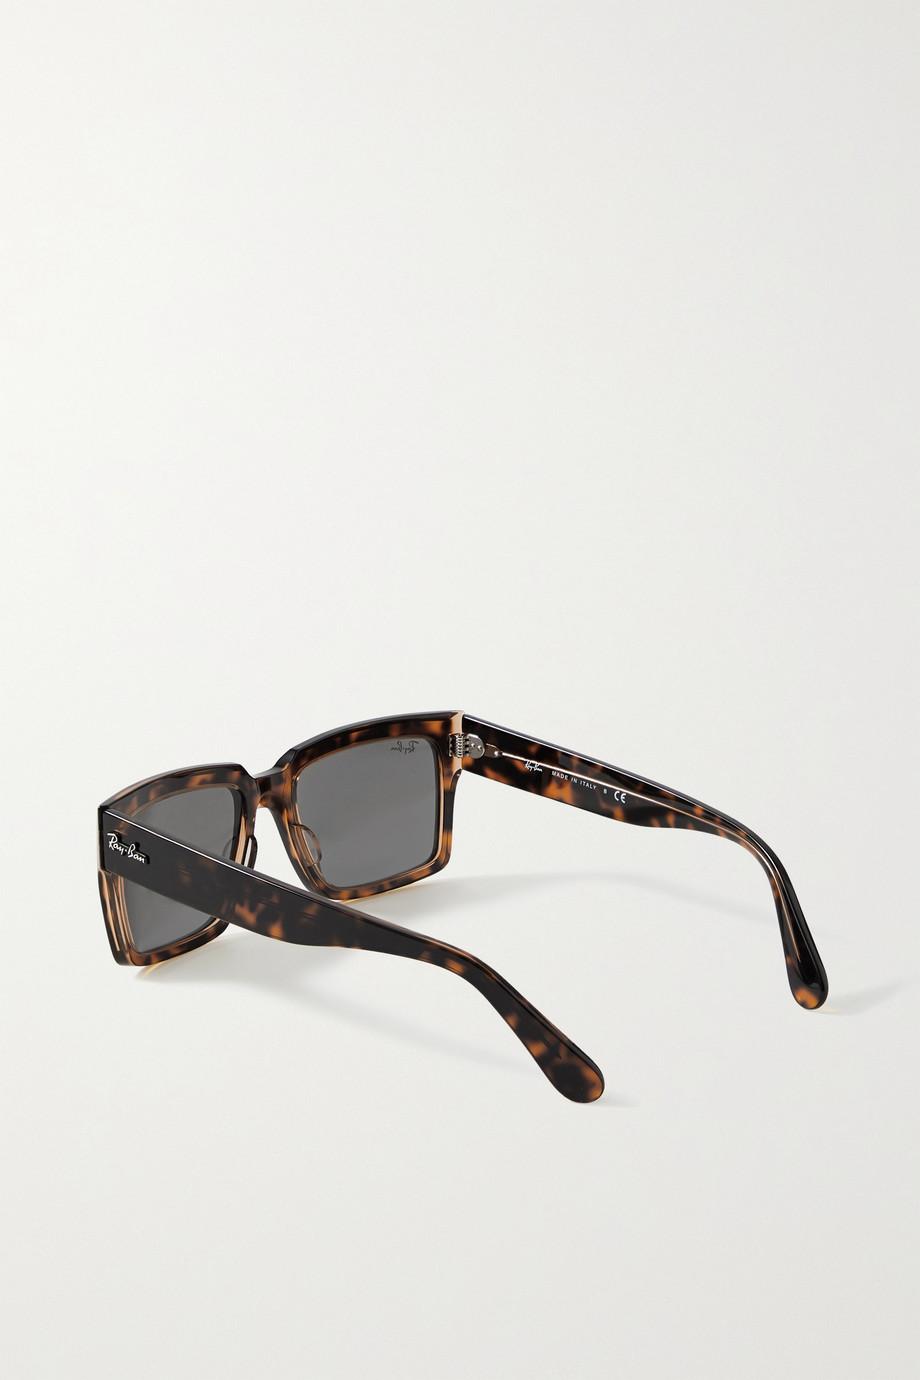 Ray-Ban Inverness rectangular-frame tortoiseshell acetate sunglasses